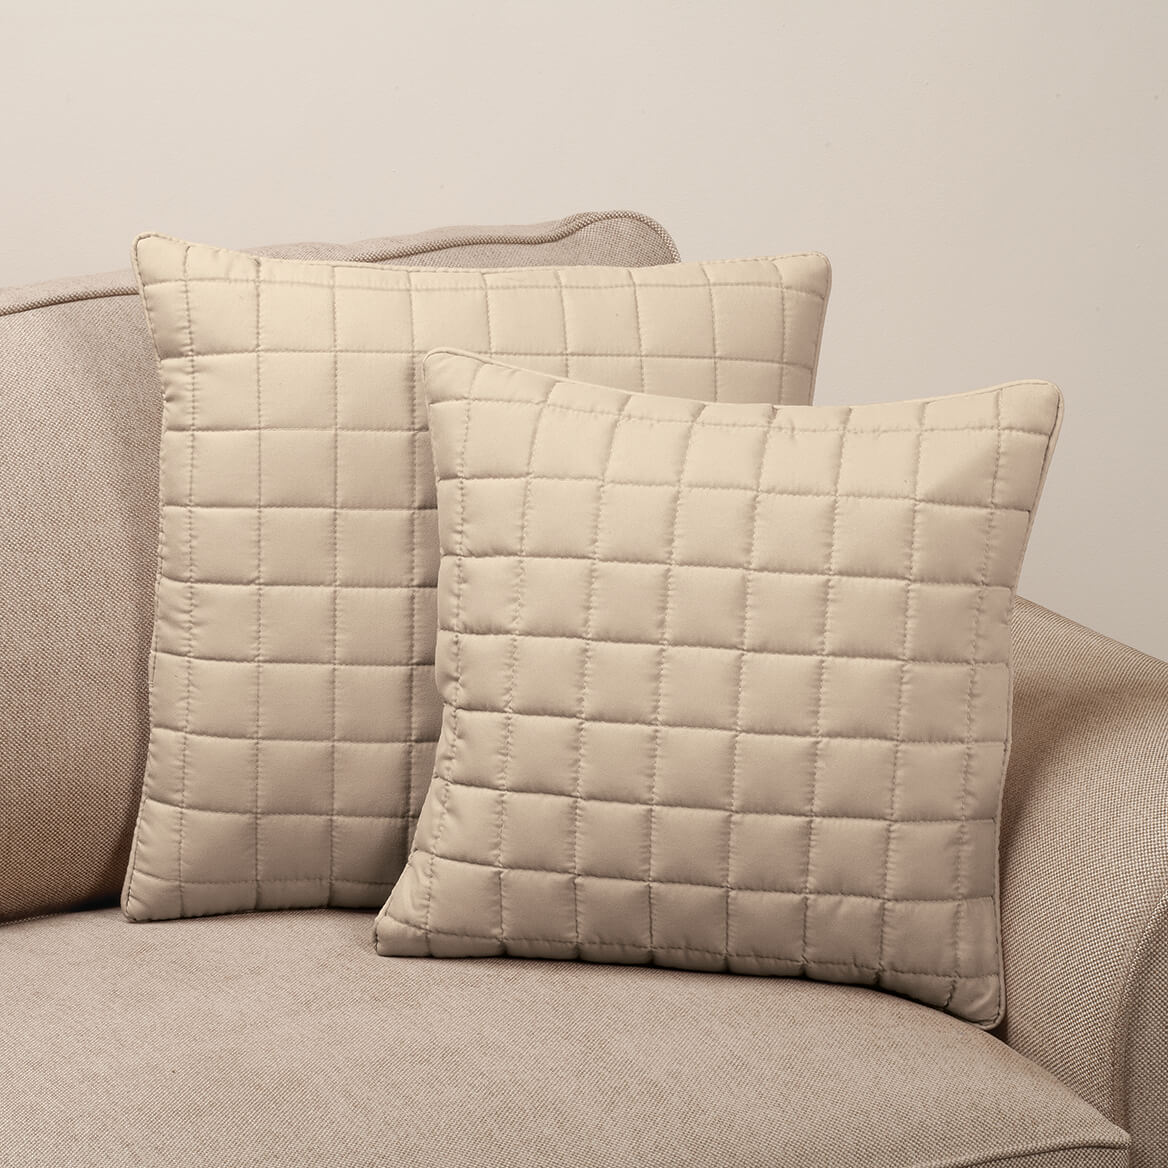 Fantastic Microfiber Cushion Covers Match Search Singles Free Theyellowbook Wood Chair Design Ideas Theyellowbookinfo